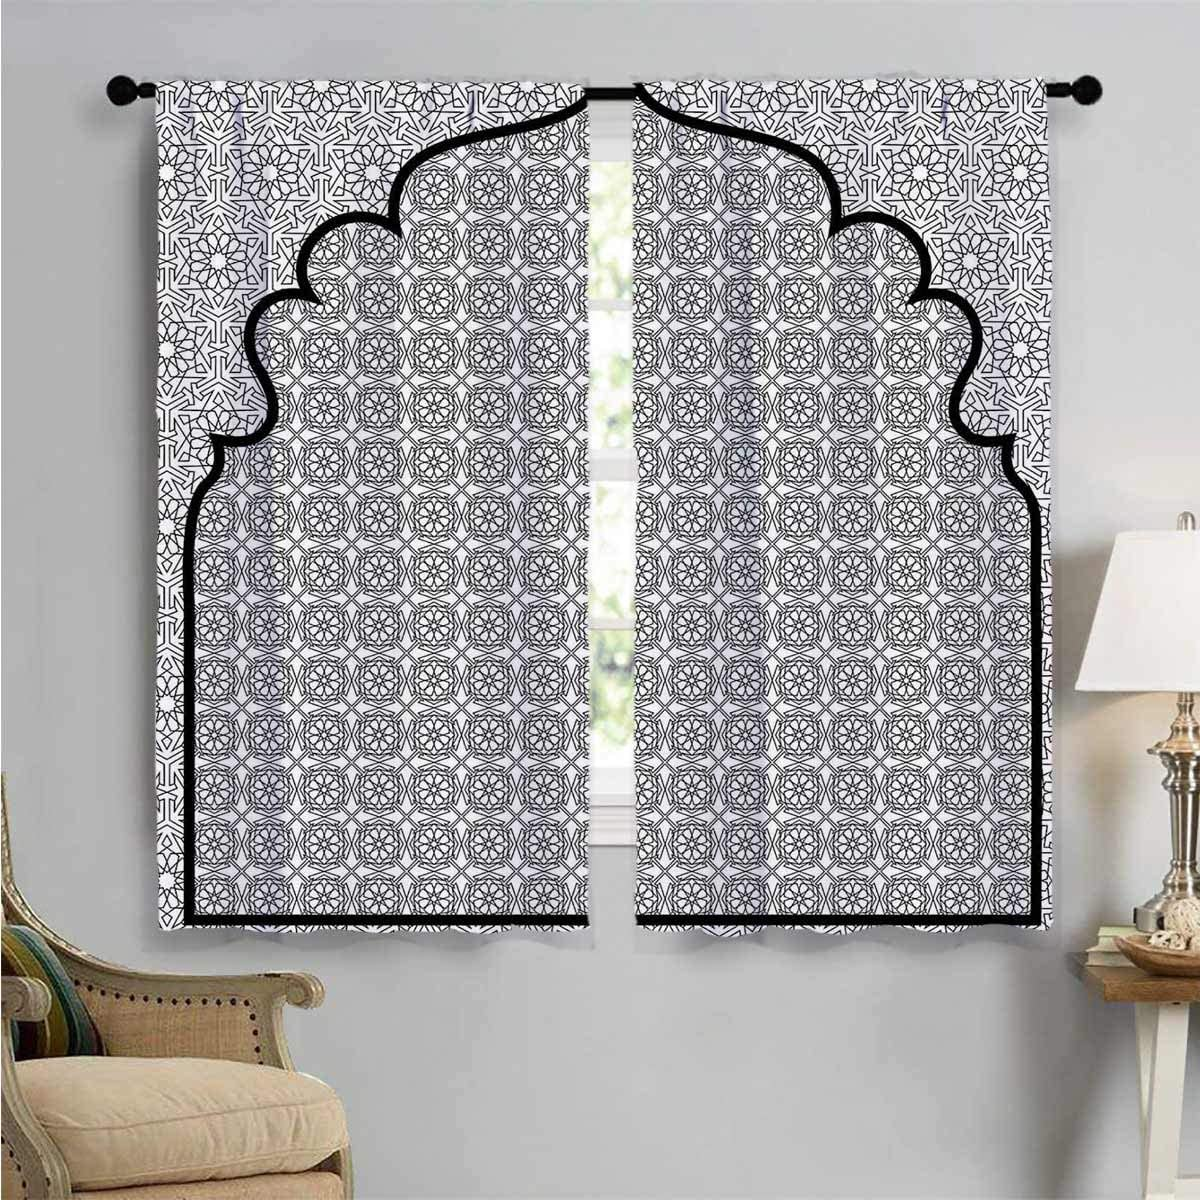 Blackout Window Boston Mall Curtain Turkish Decor Curtains At the price Mosaic Ottoman